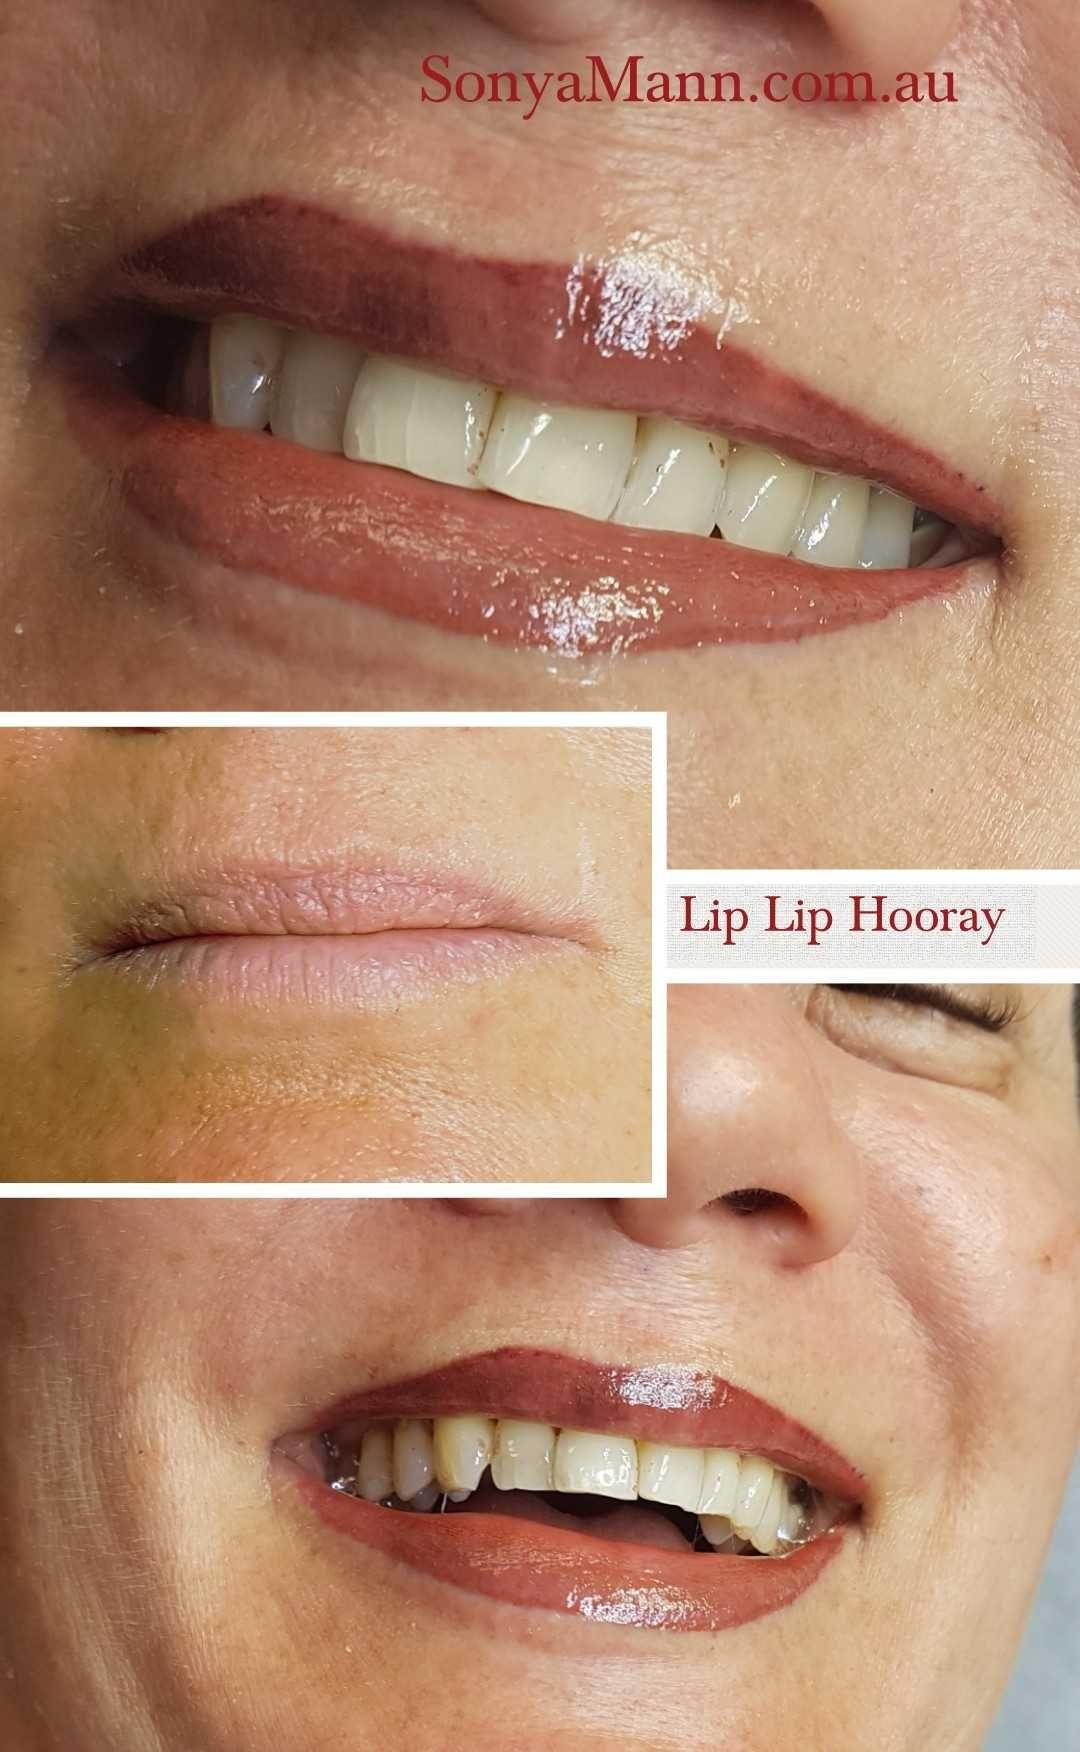 Lip lip hooray as we get older our lips lose their